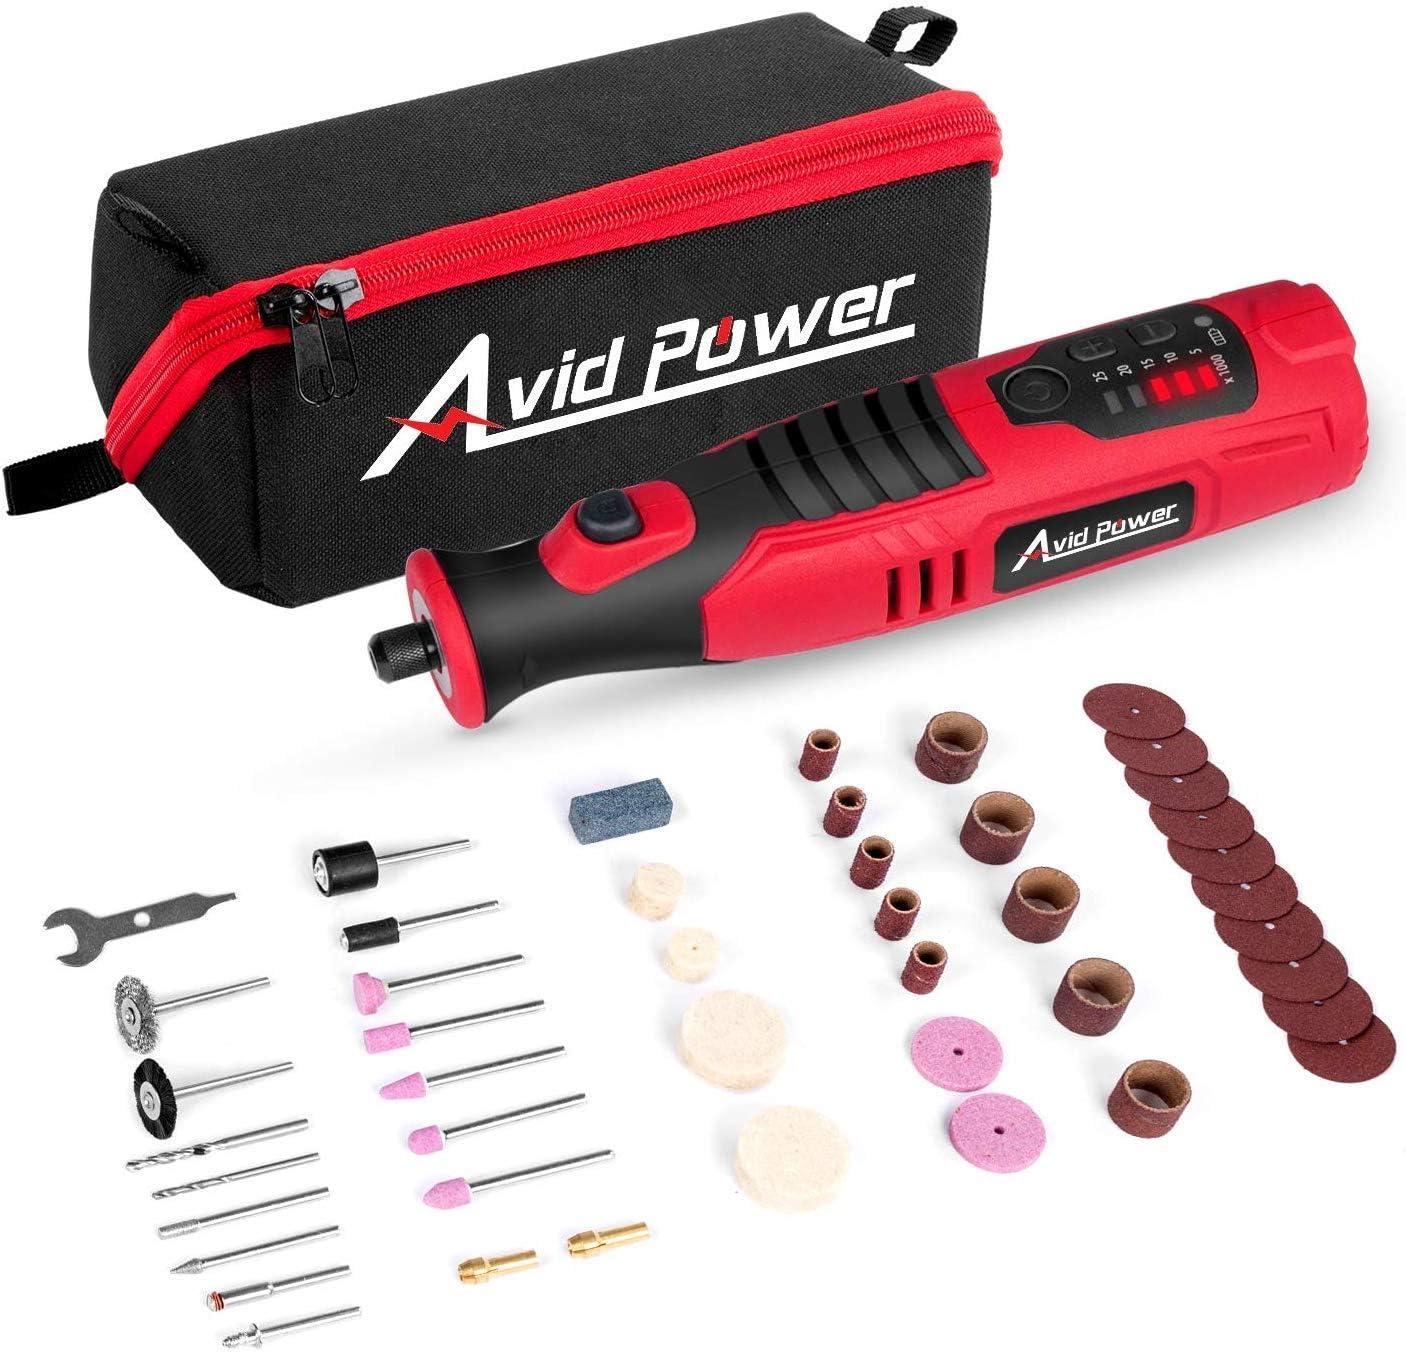 Avid Power Cordless best Rotary Tool